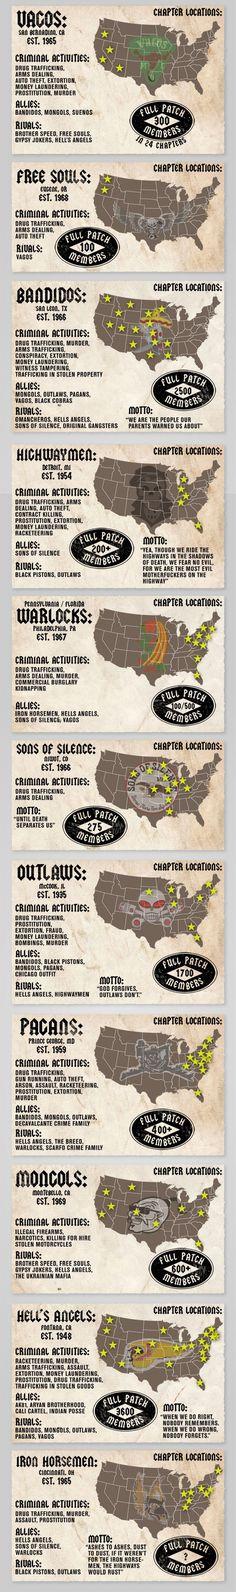 Biker Gangs of America | Best Infographics